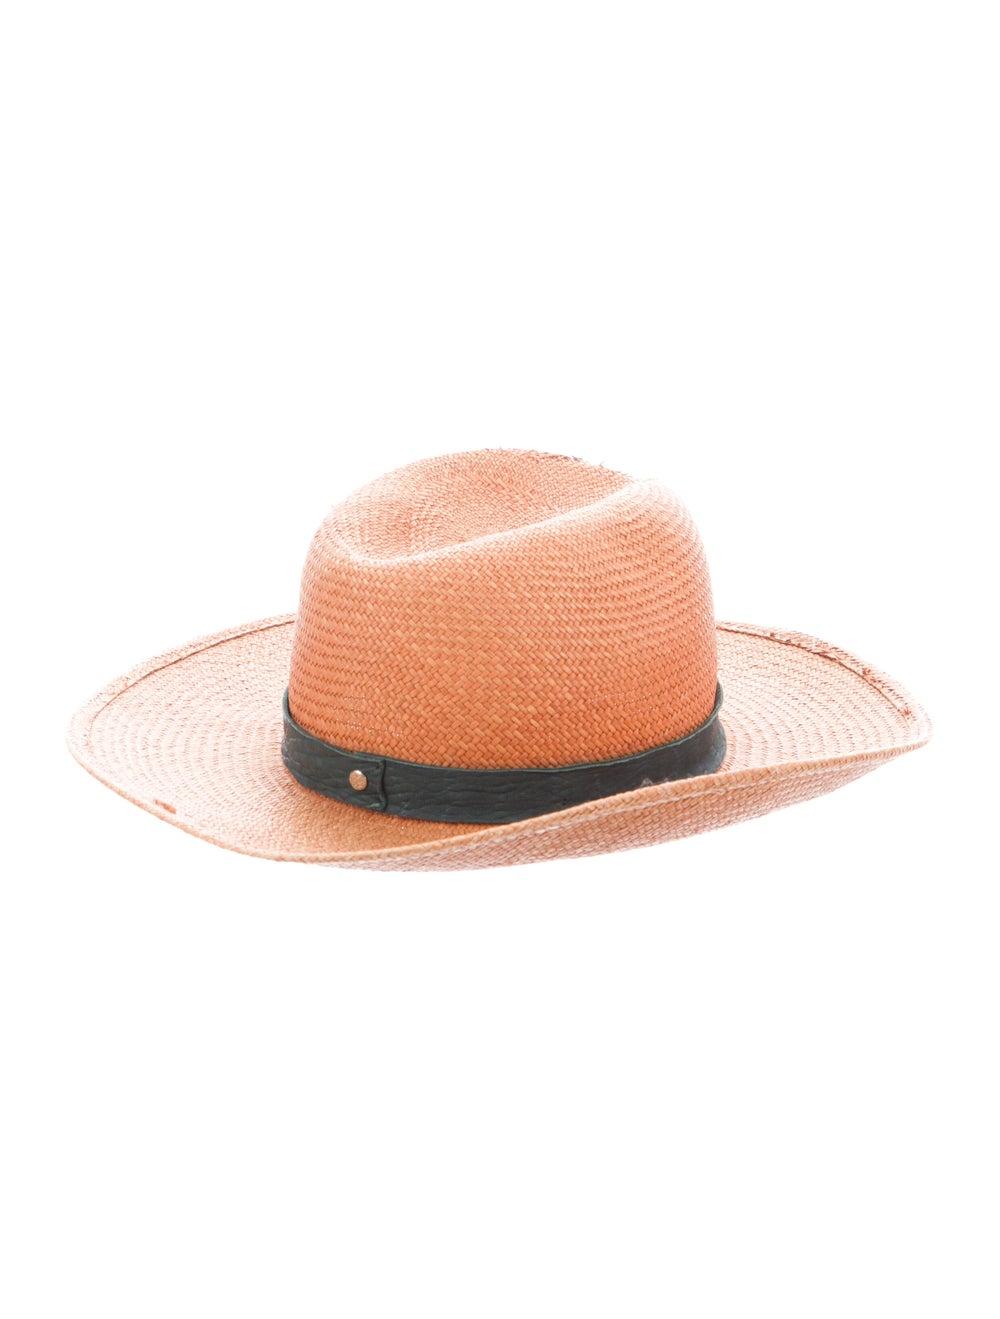 Janessa Leone Straw Wide Brim Hat Tan - image 2